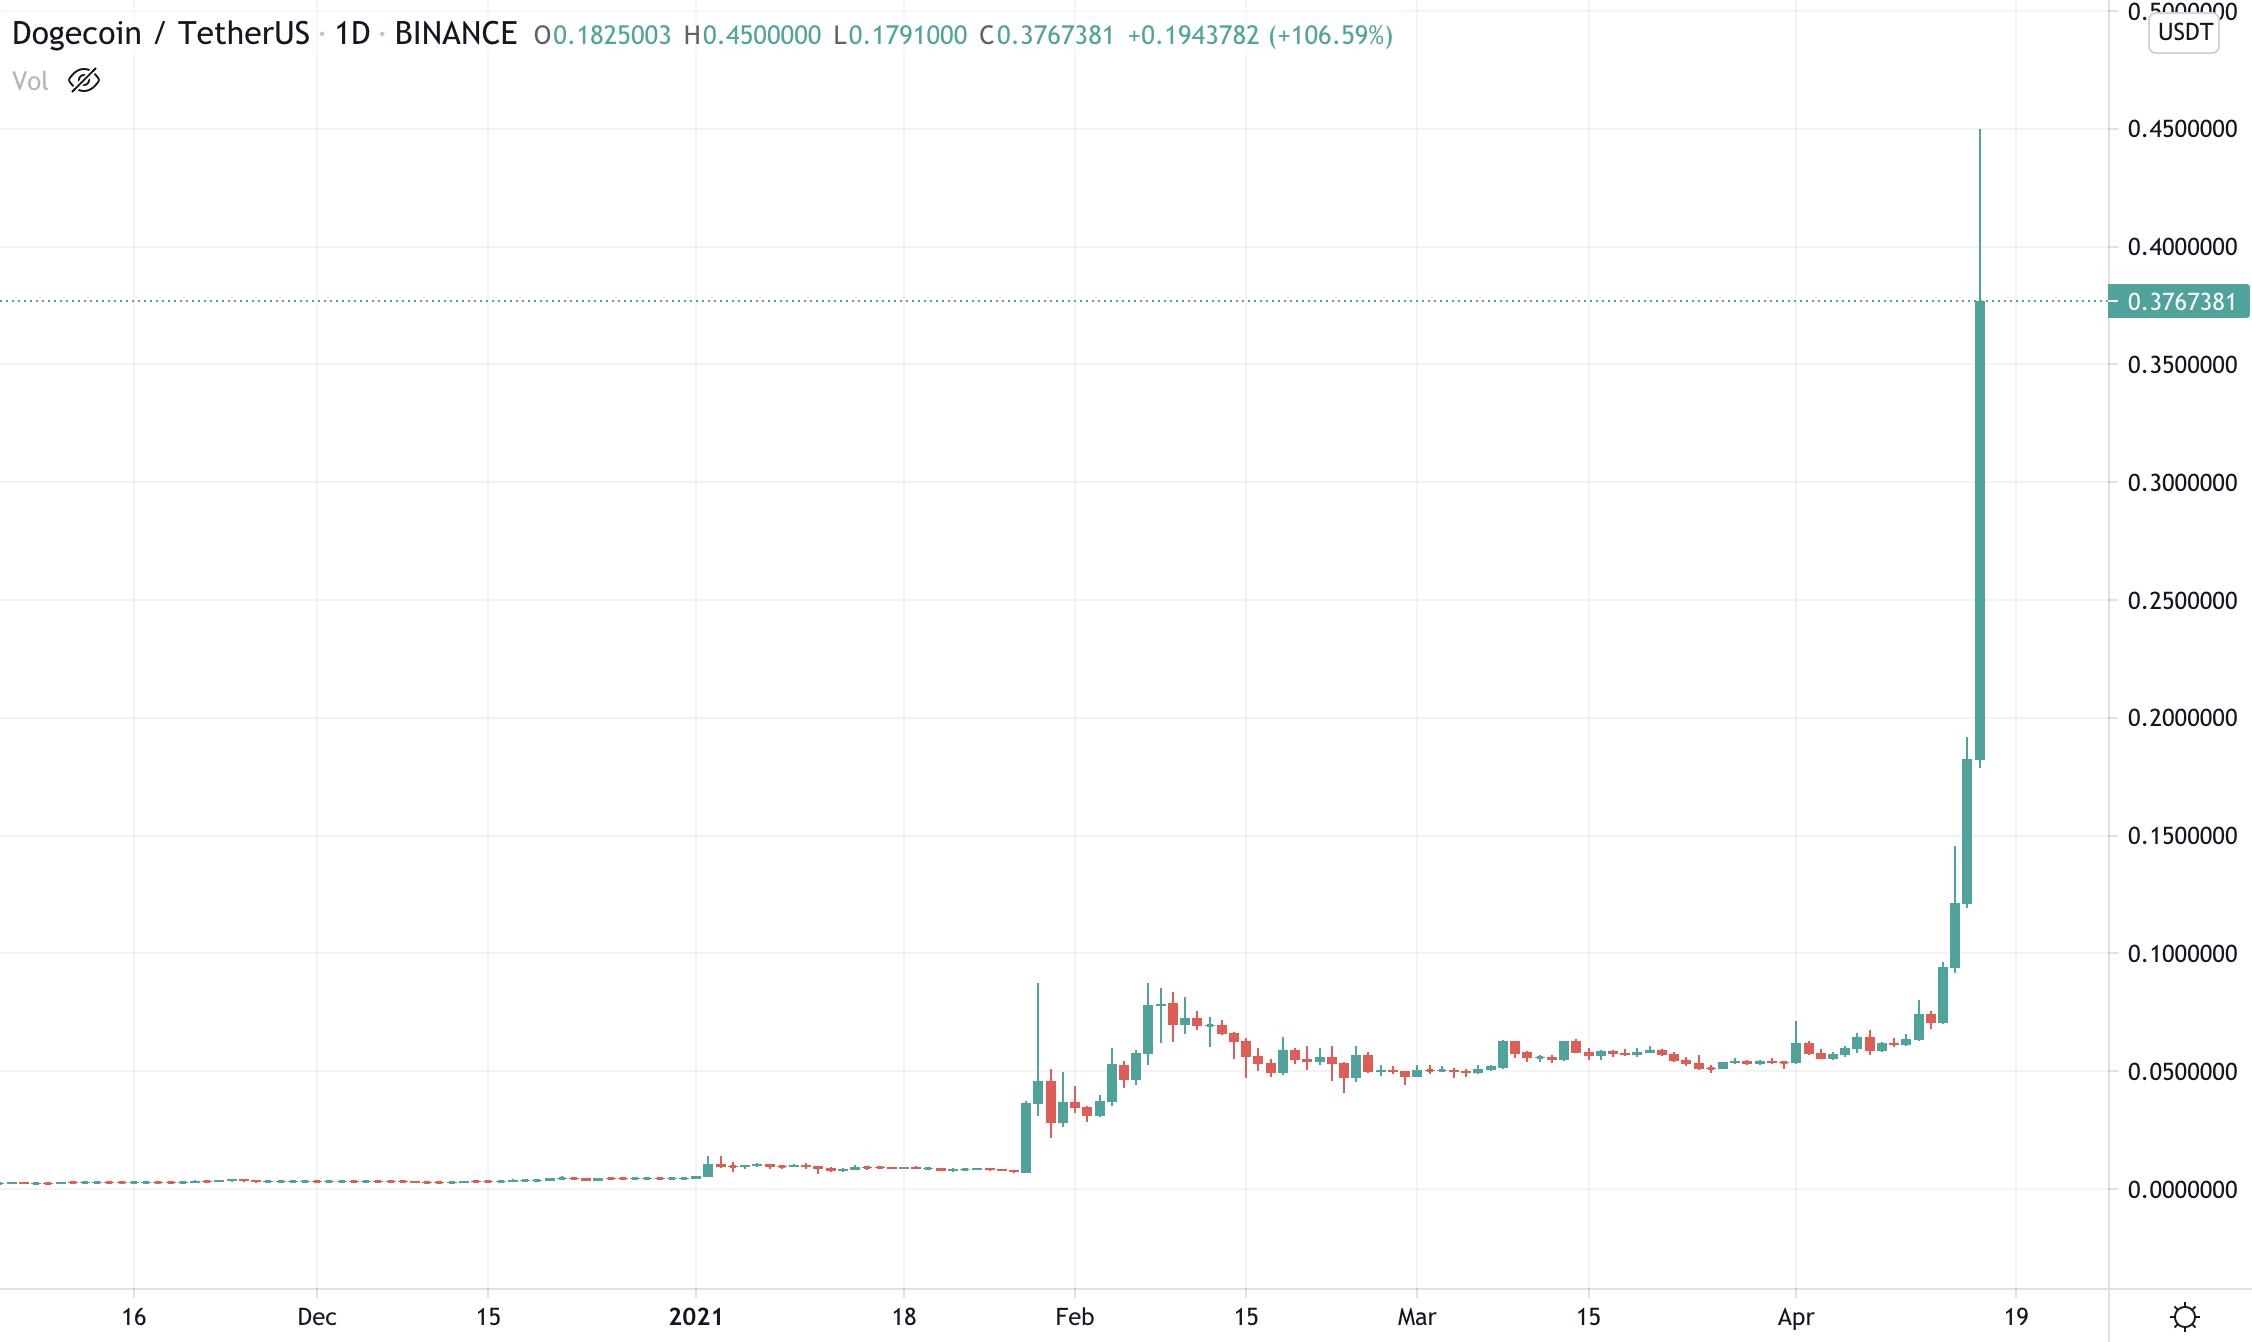 Meme-themed crypto Dogecoin's latest surge pushes price past $0.40